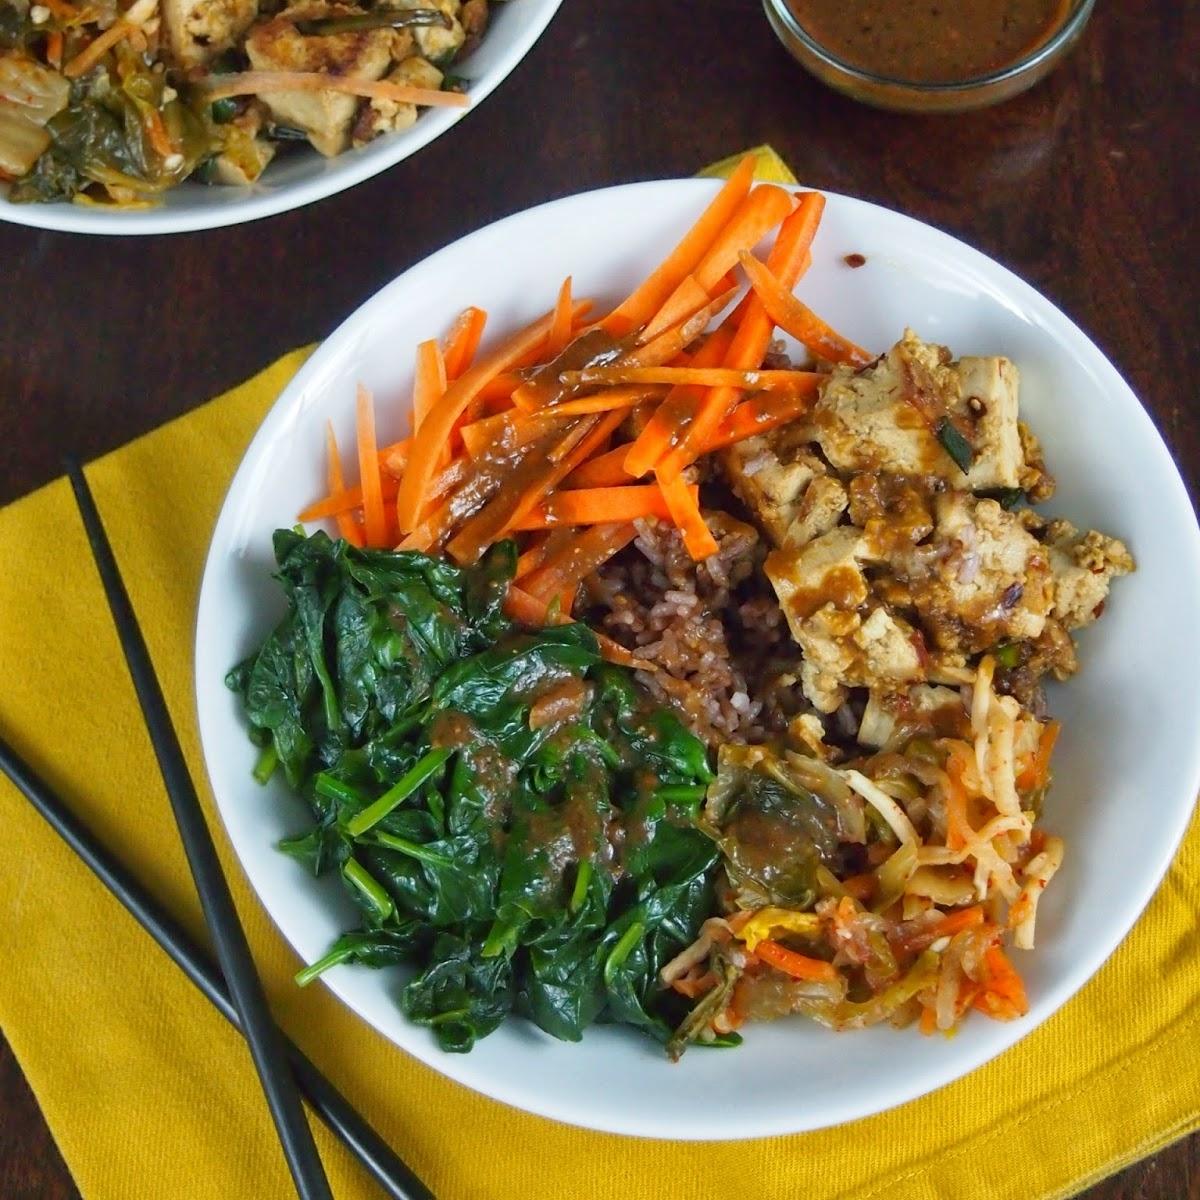 Buddha Bowl with Marinated Tofu, Kimchi, and Spinach